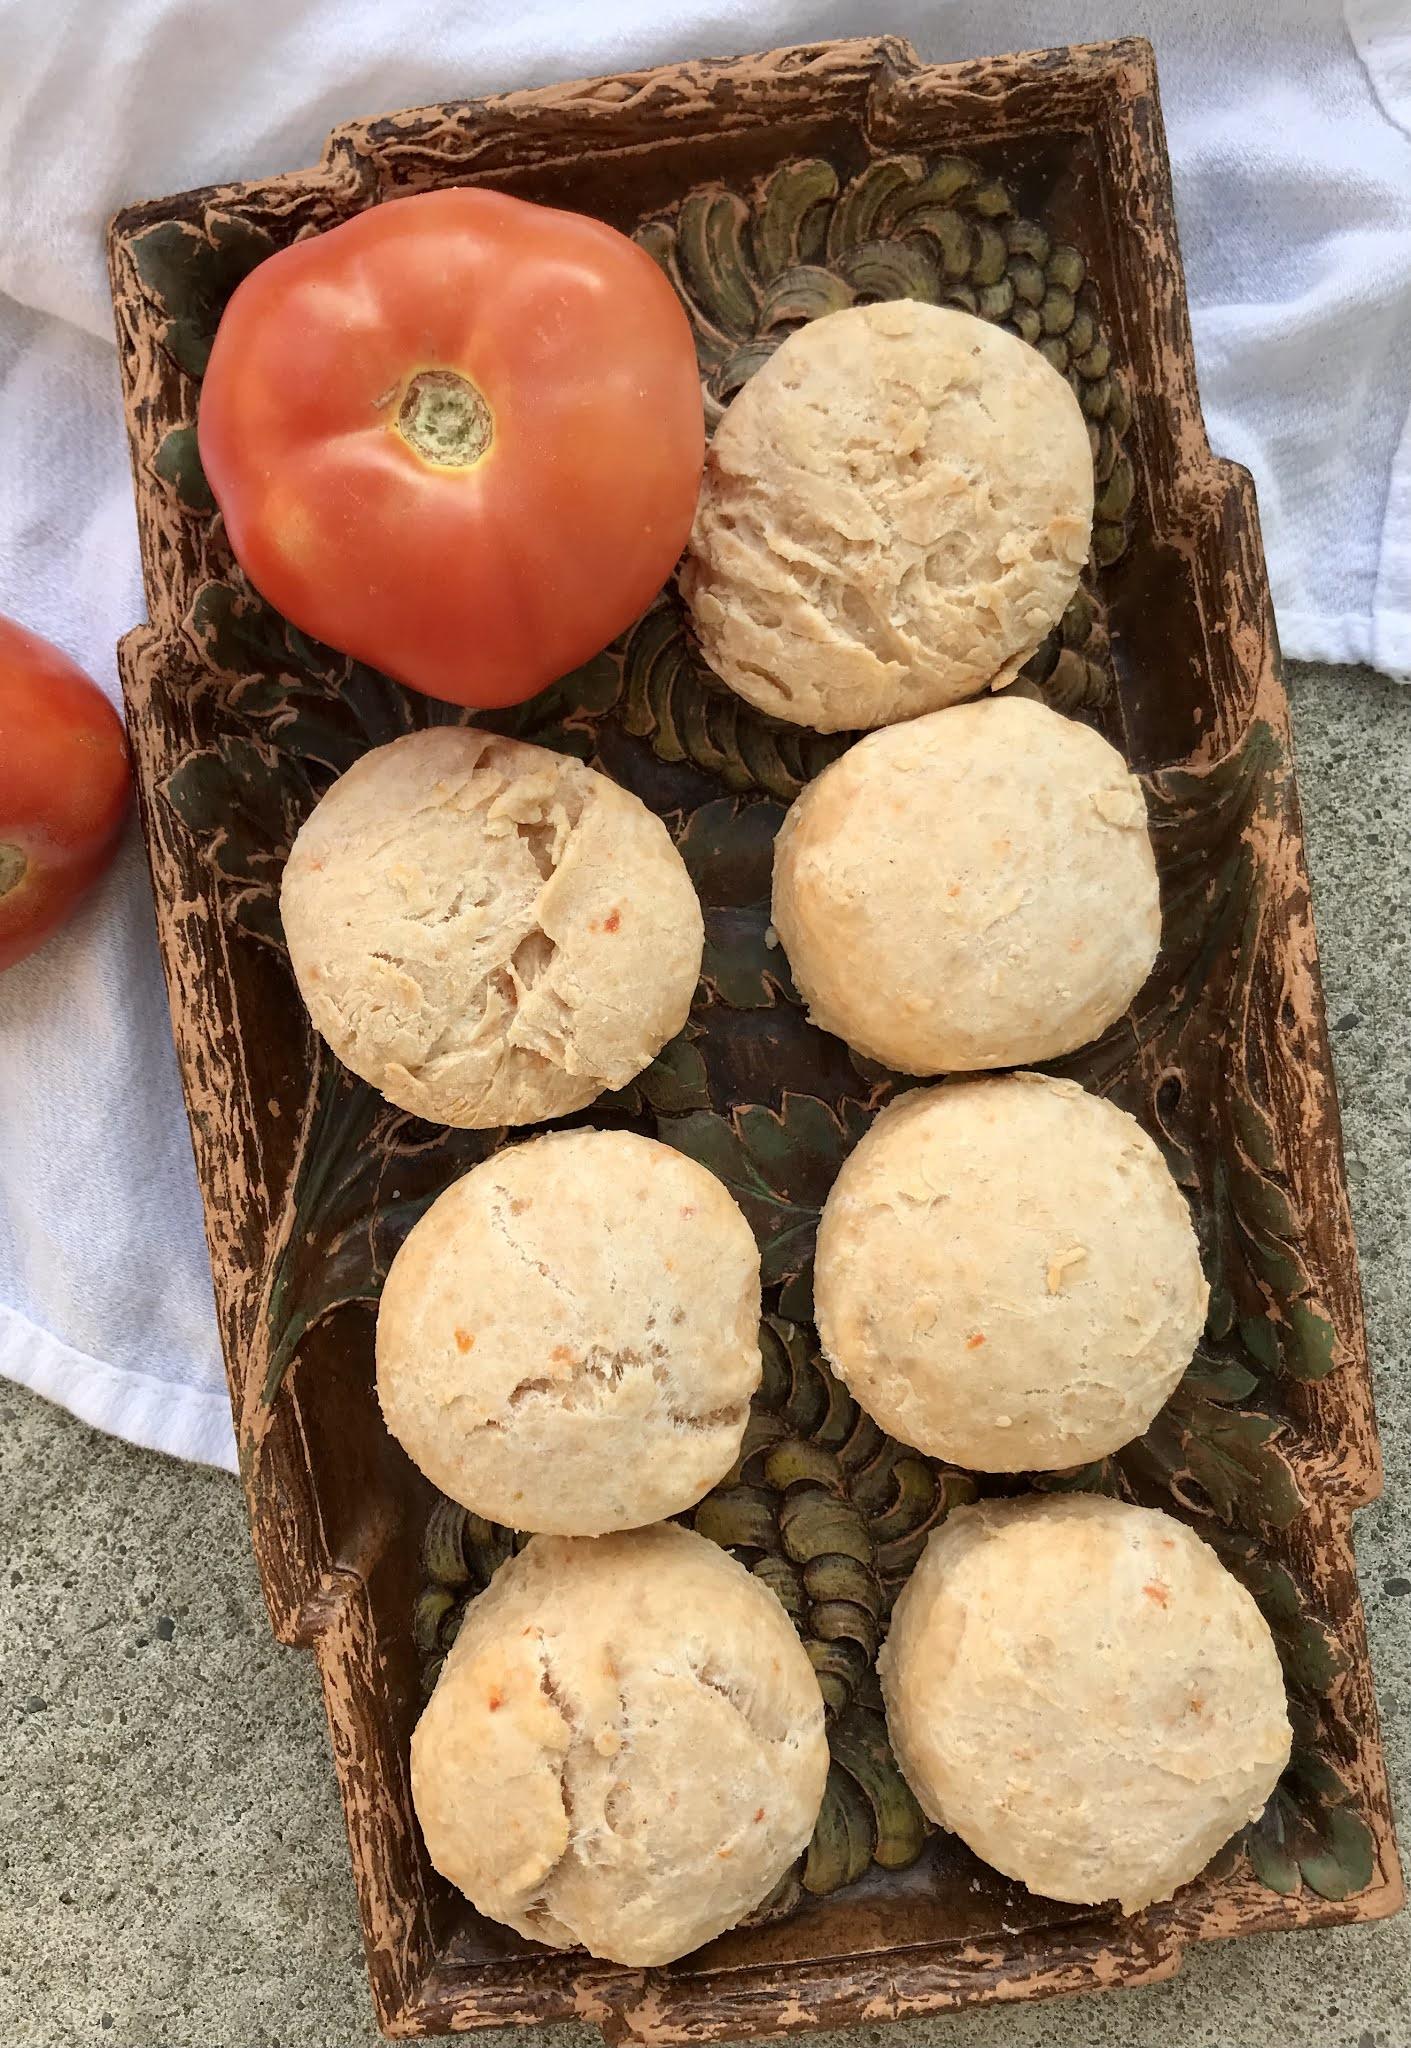 Tomato Parmesan Buttermilk Biscuits